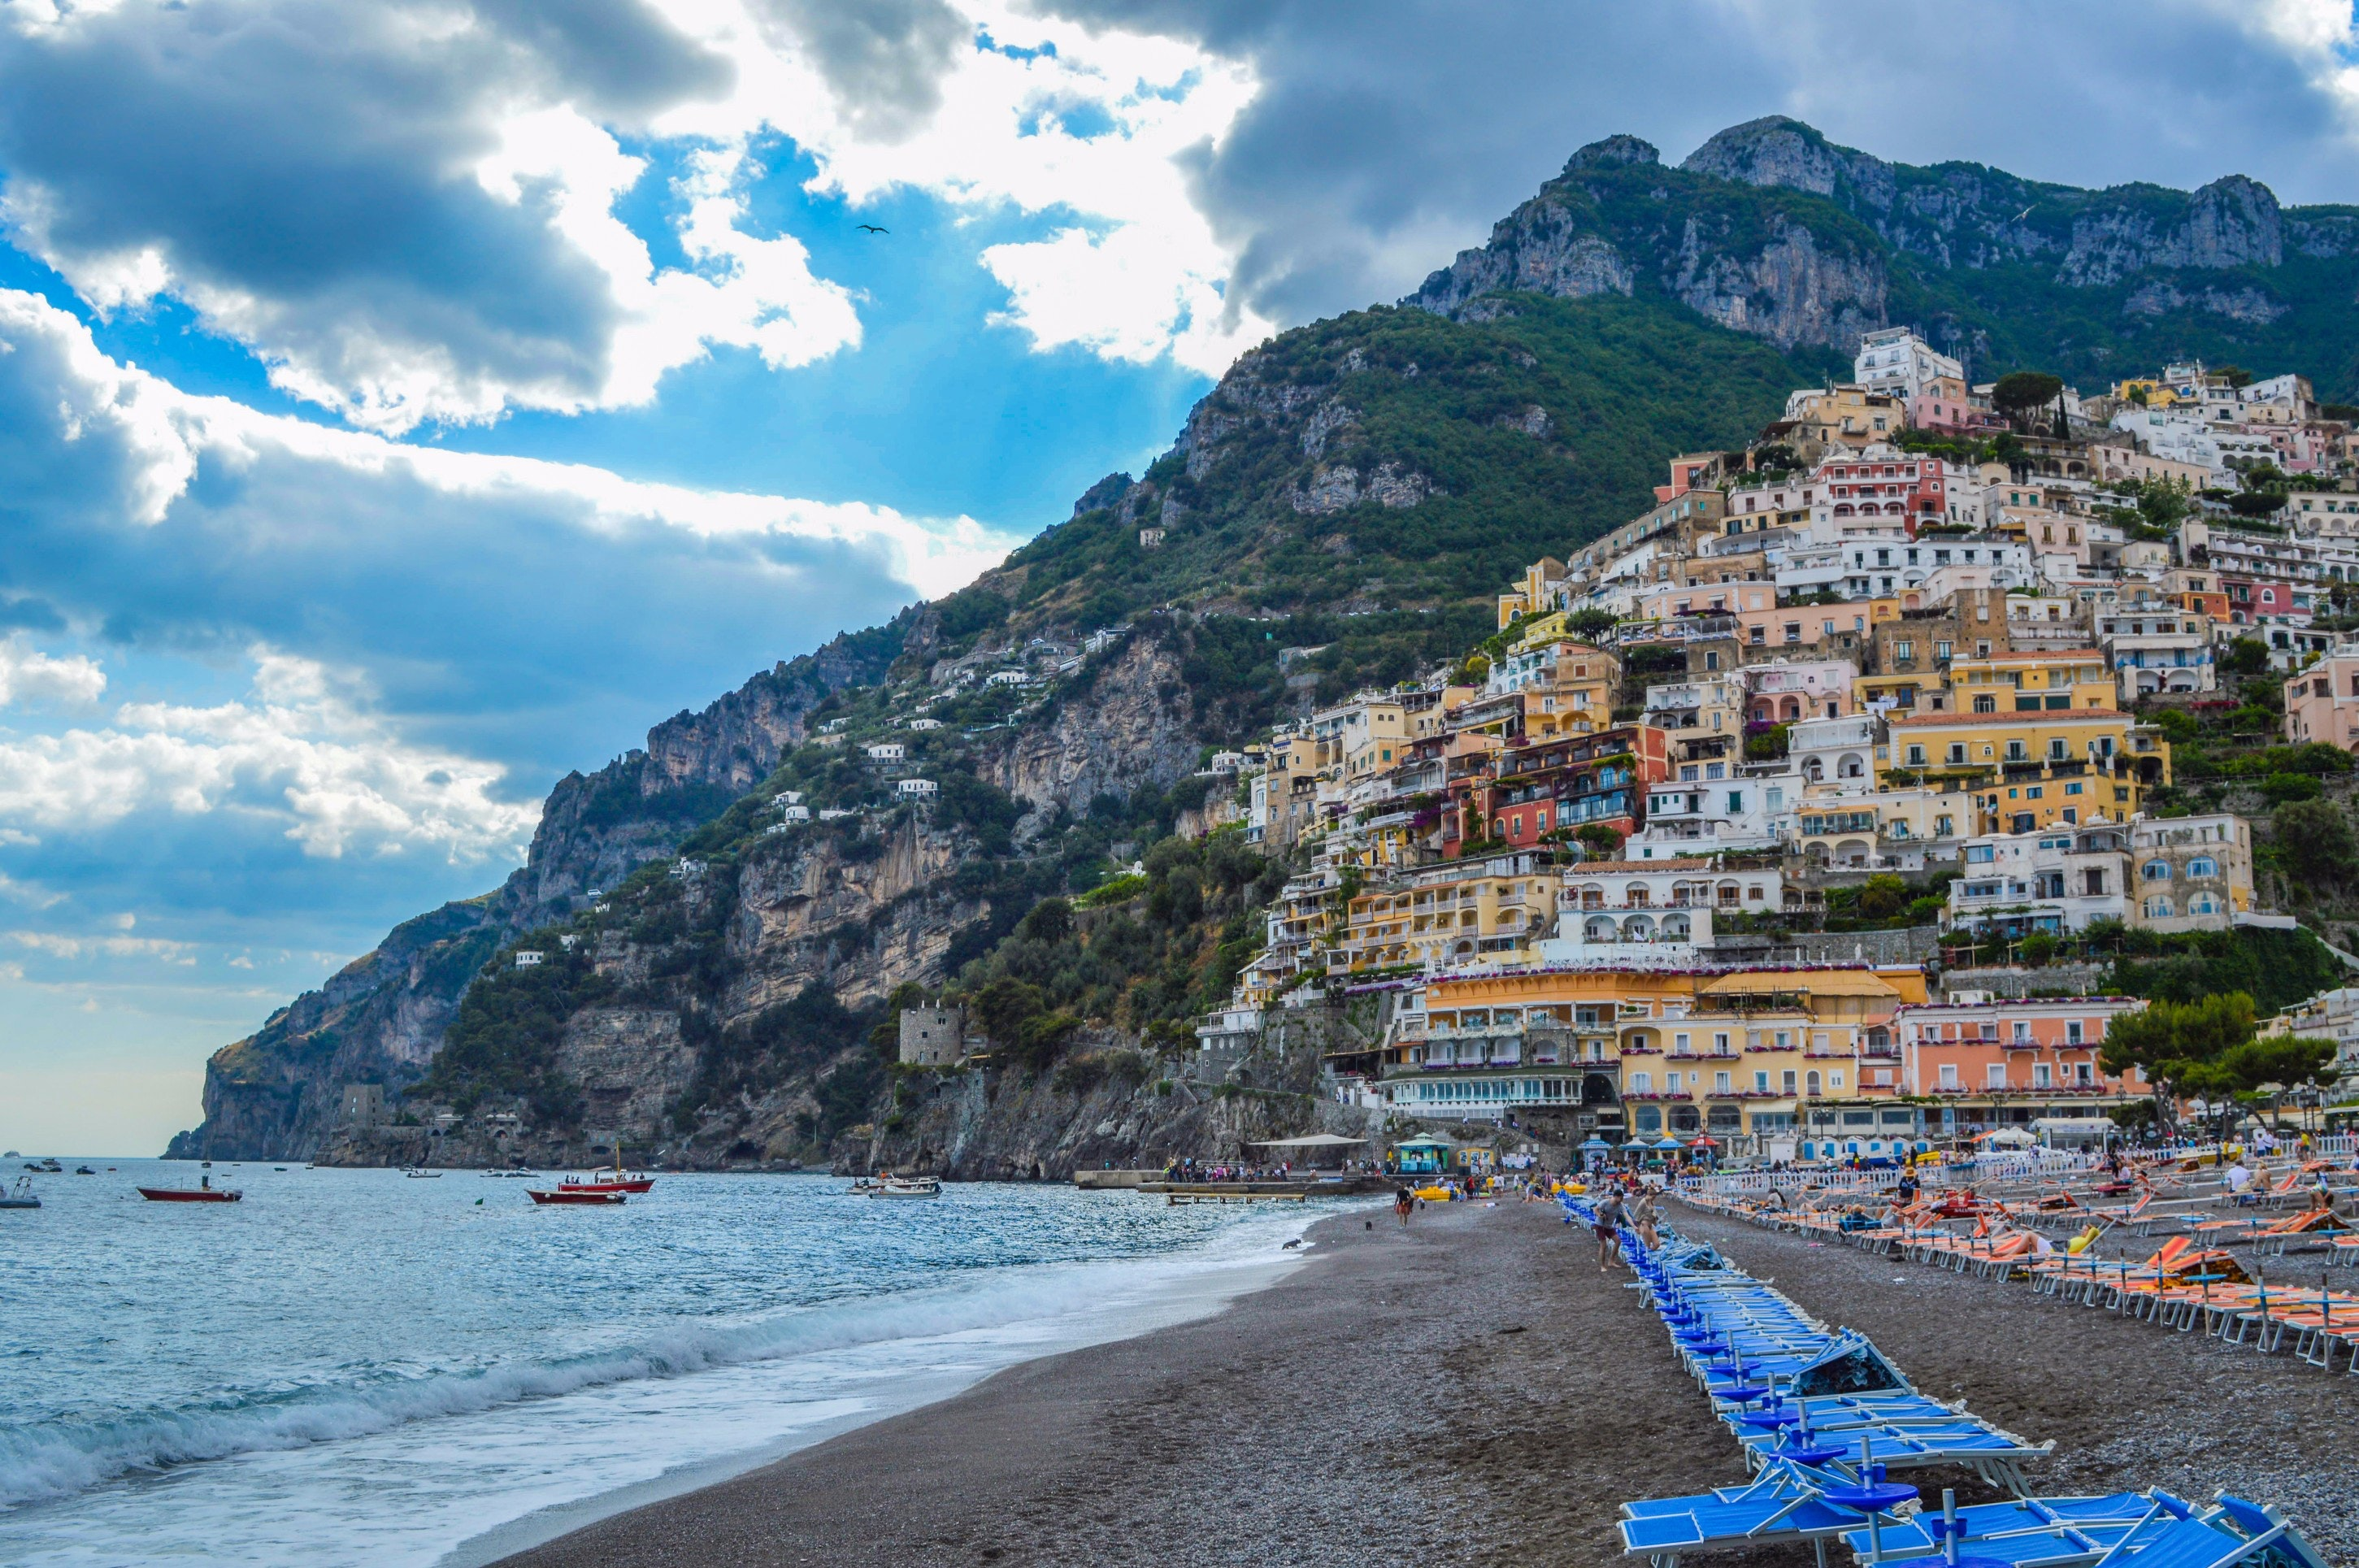 Photography of beach near mountain